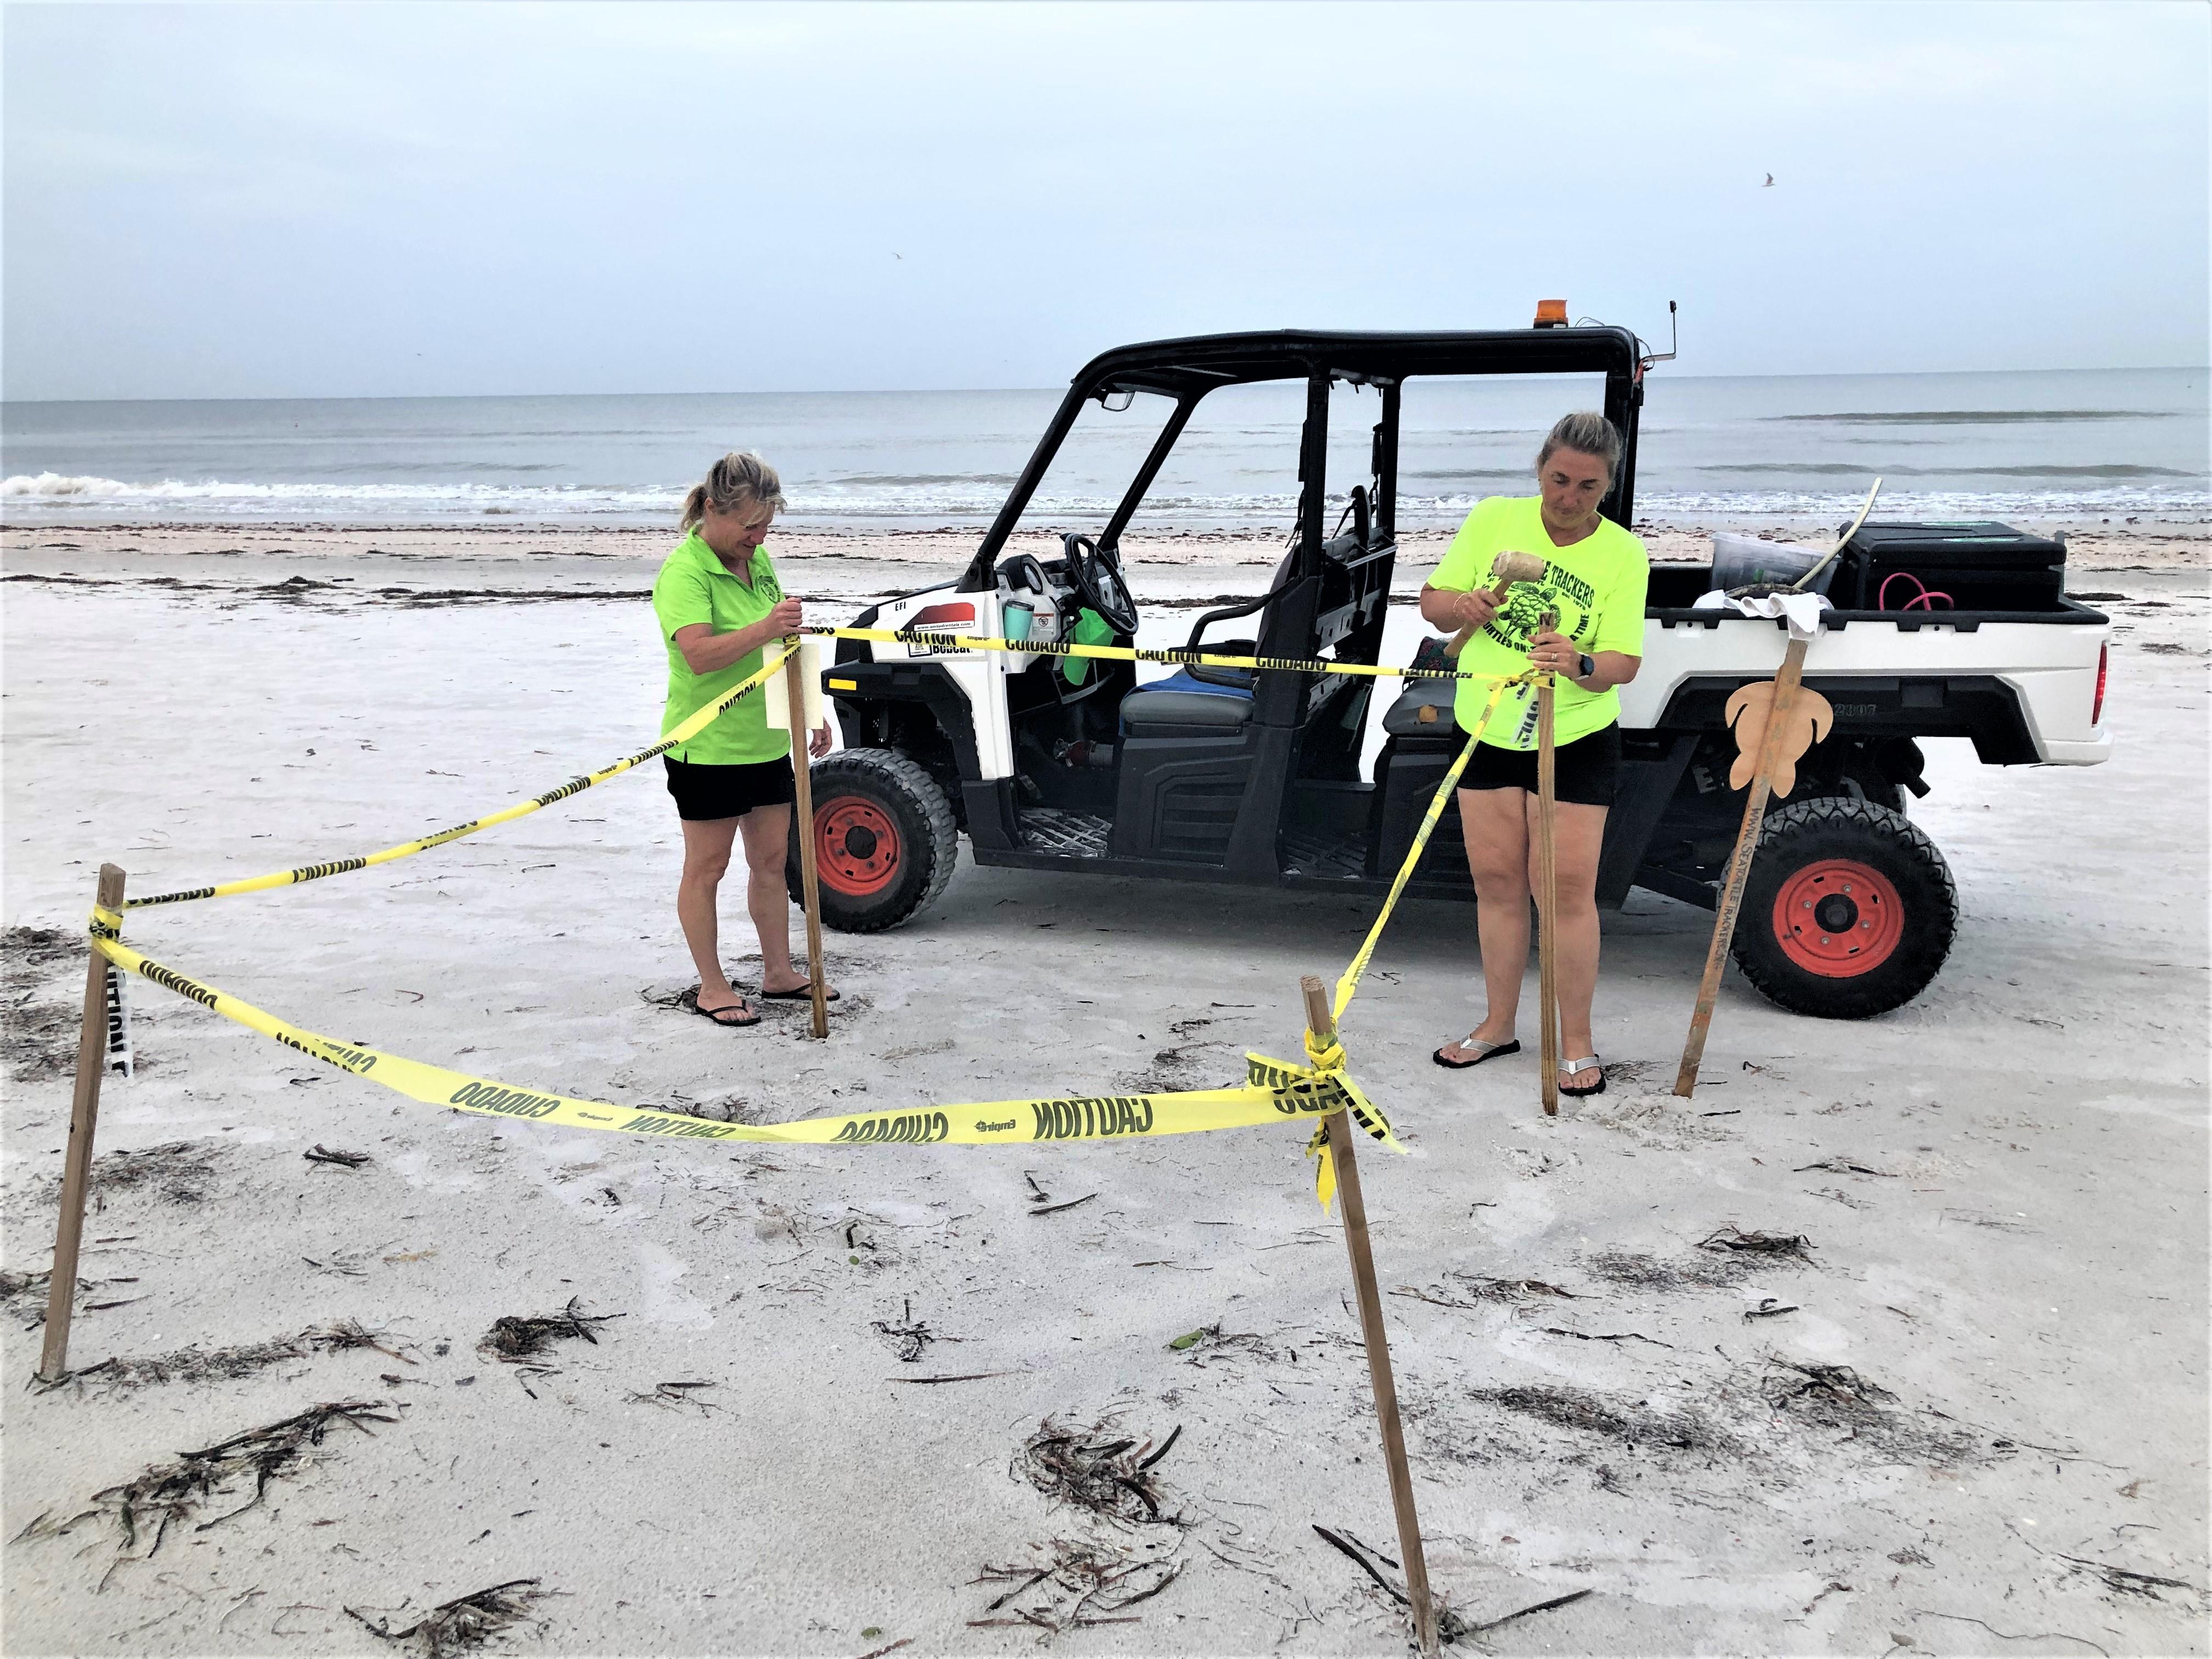 Volunteers work on nest maintenance on the beach.